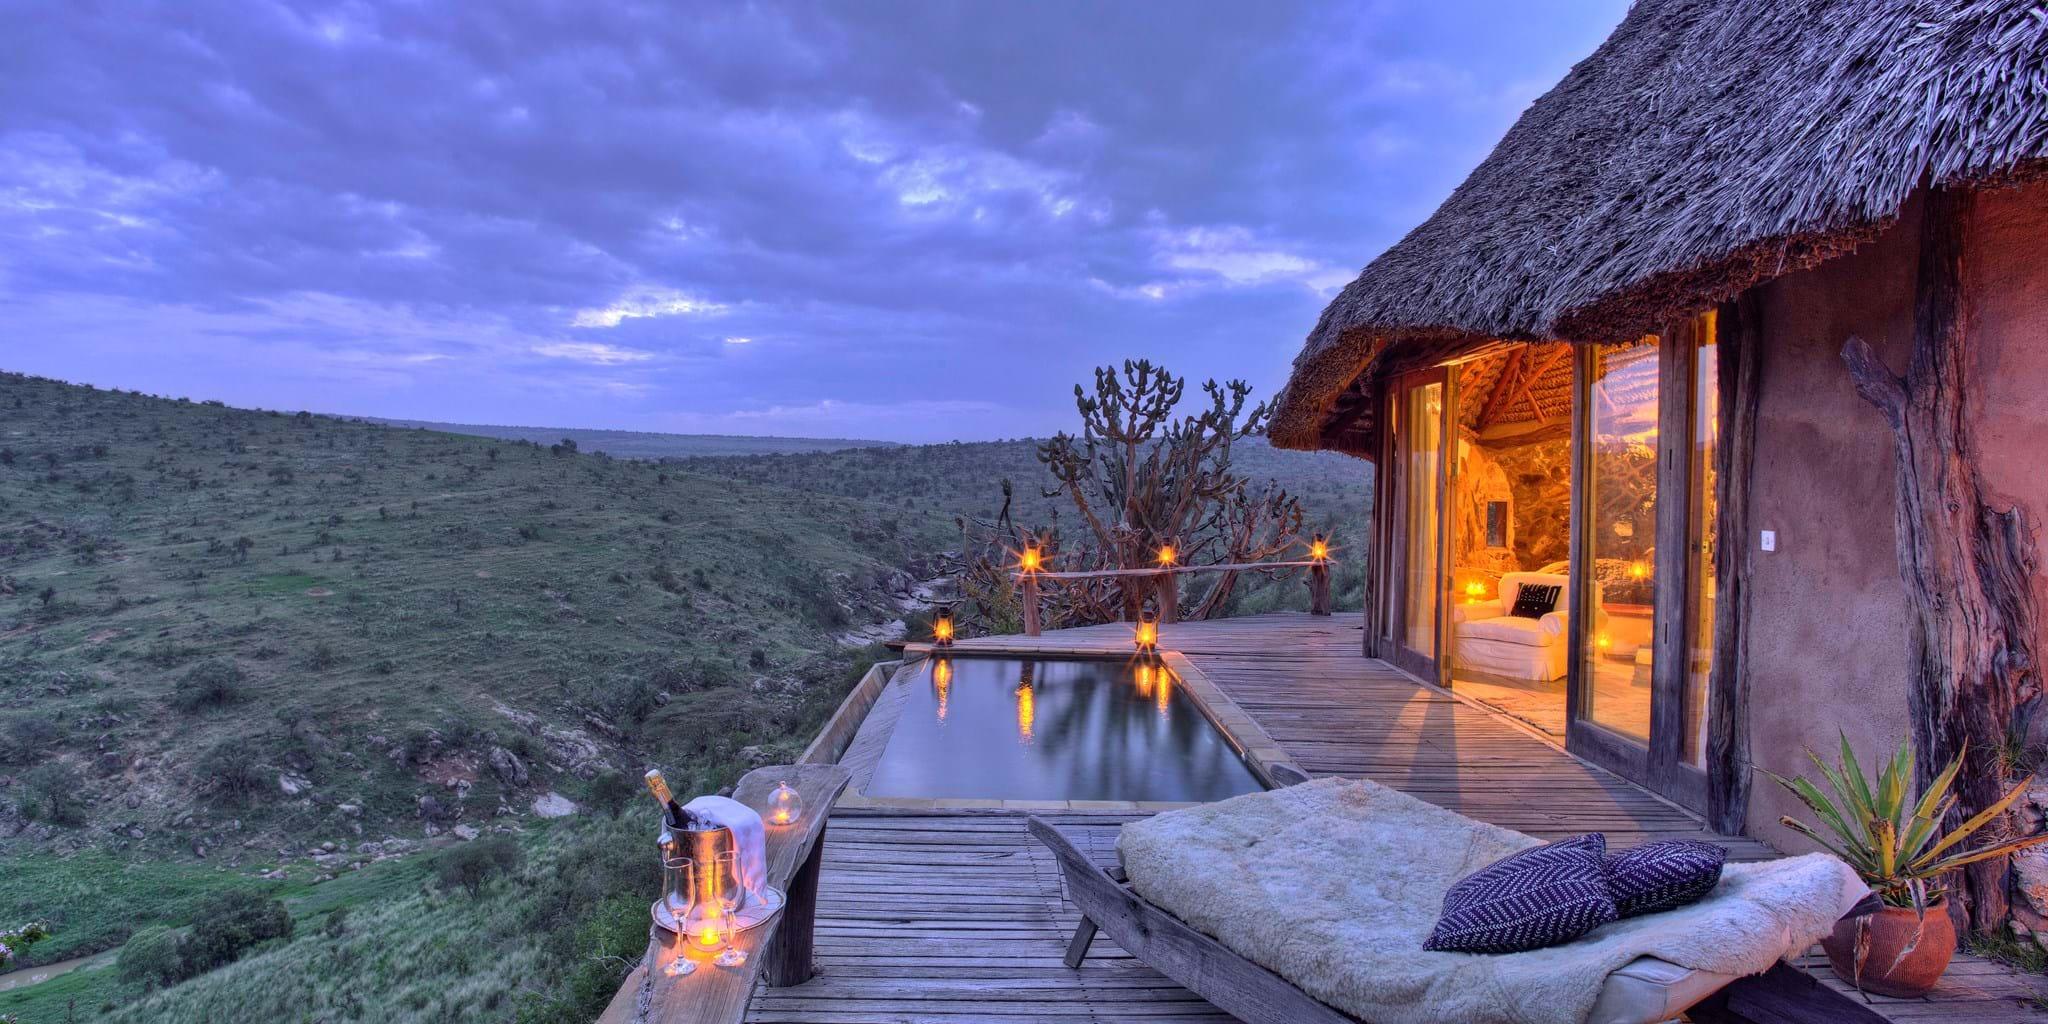 b534a62719 Borana Lodge   Luxury Lodges in Laikipia, Kenya   Yellow Zebra Safaris